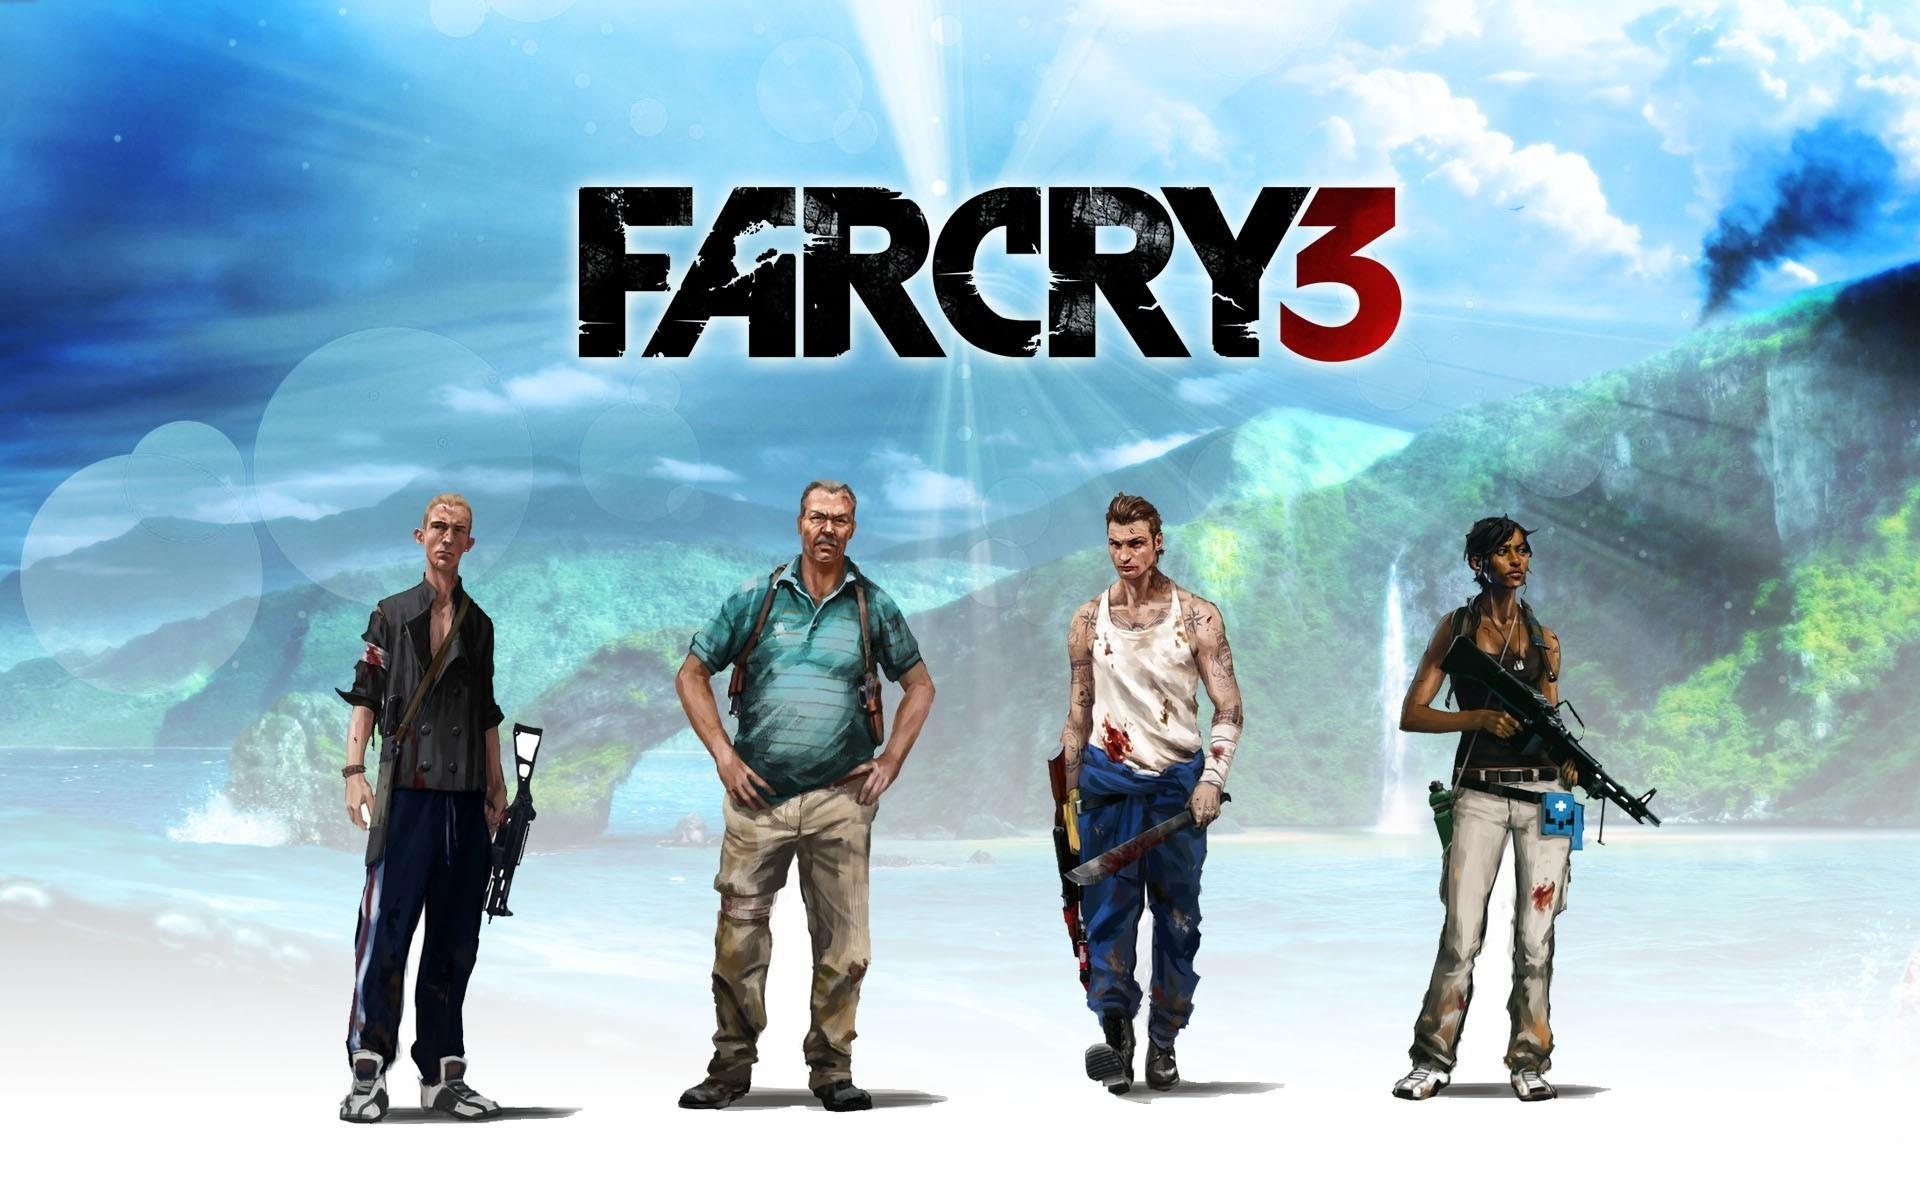 Far Cry 3 Wallpaper HD